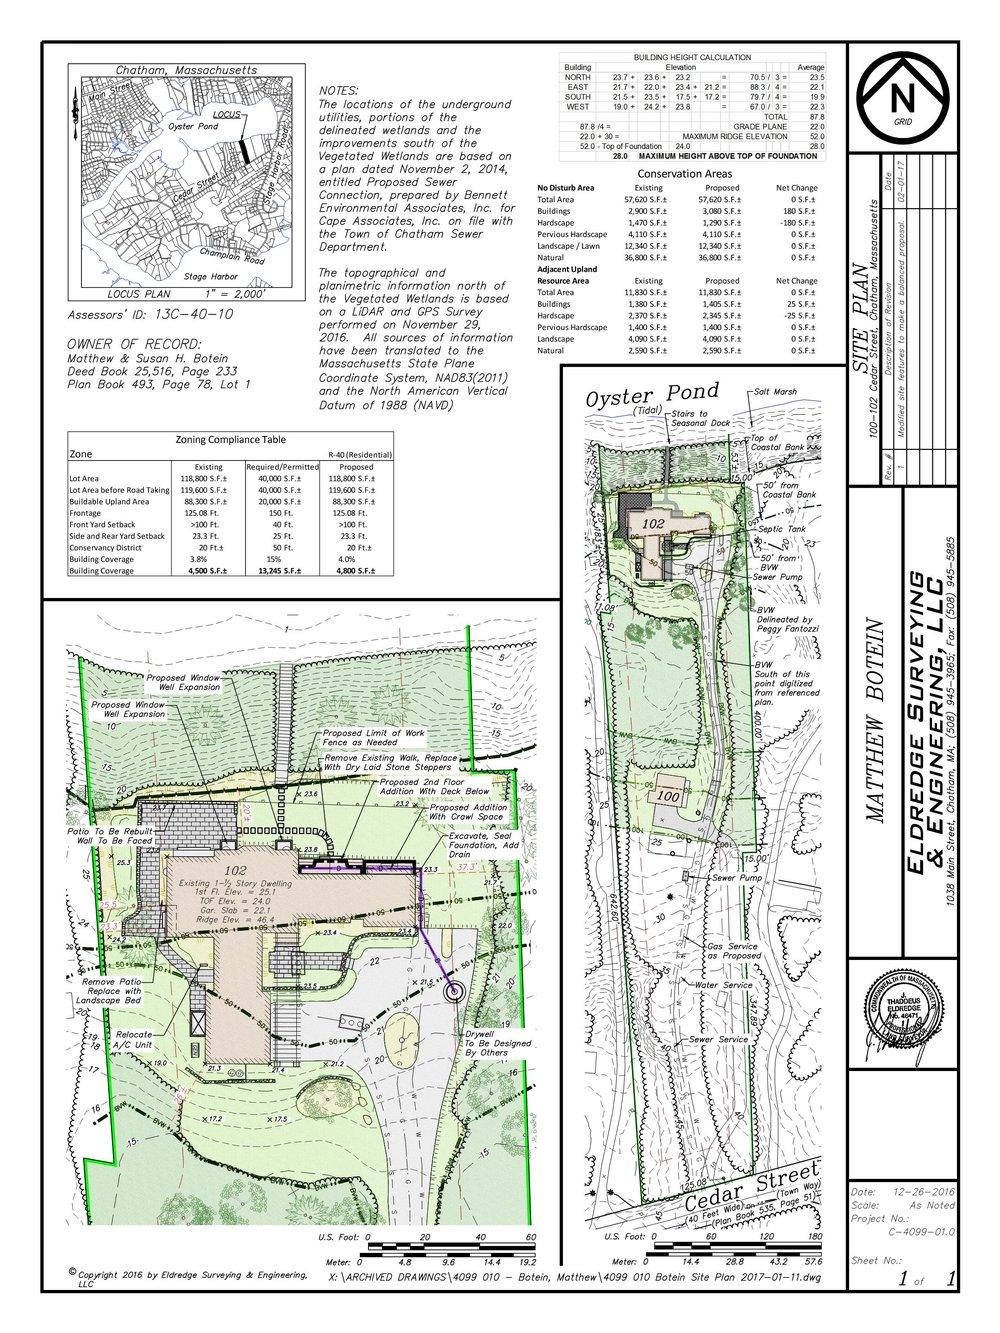 4099 010 Botein Site Plan 2017-02-01 18x24 p.jpg